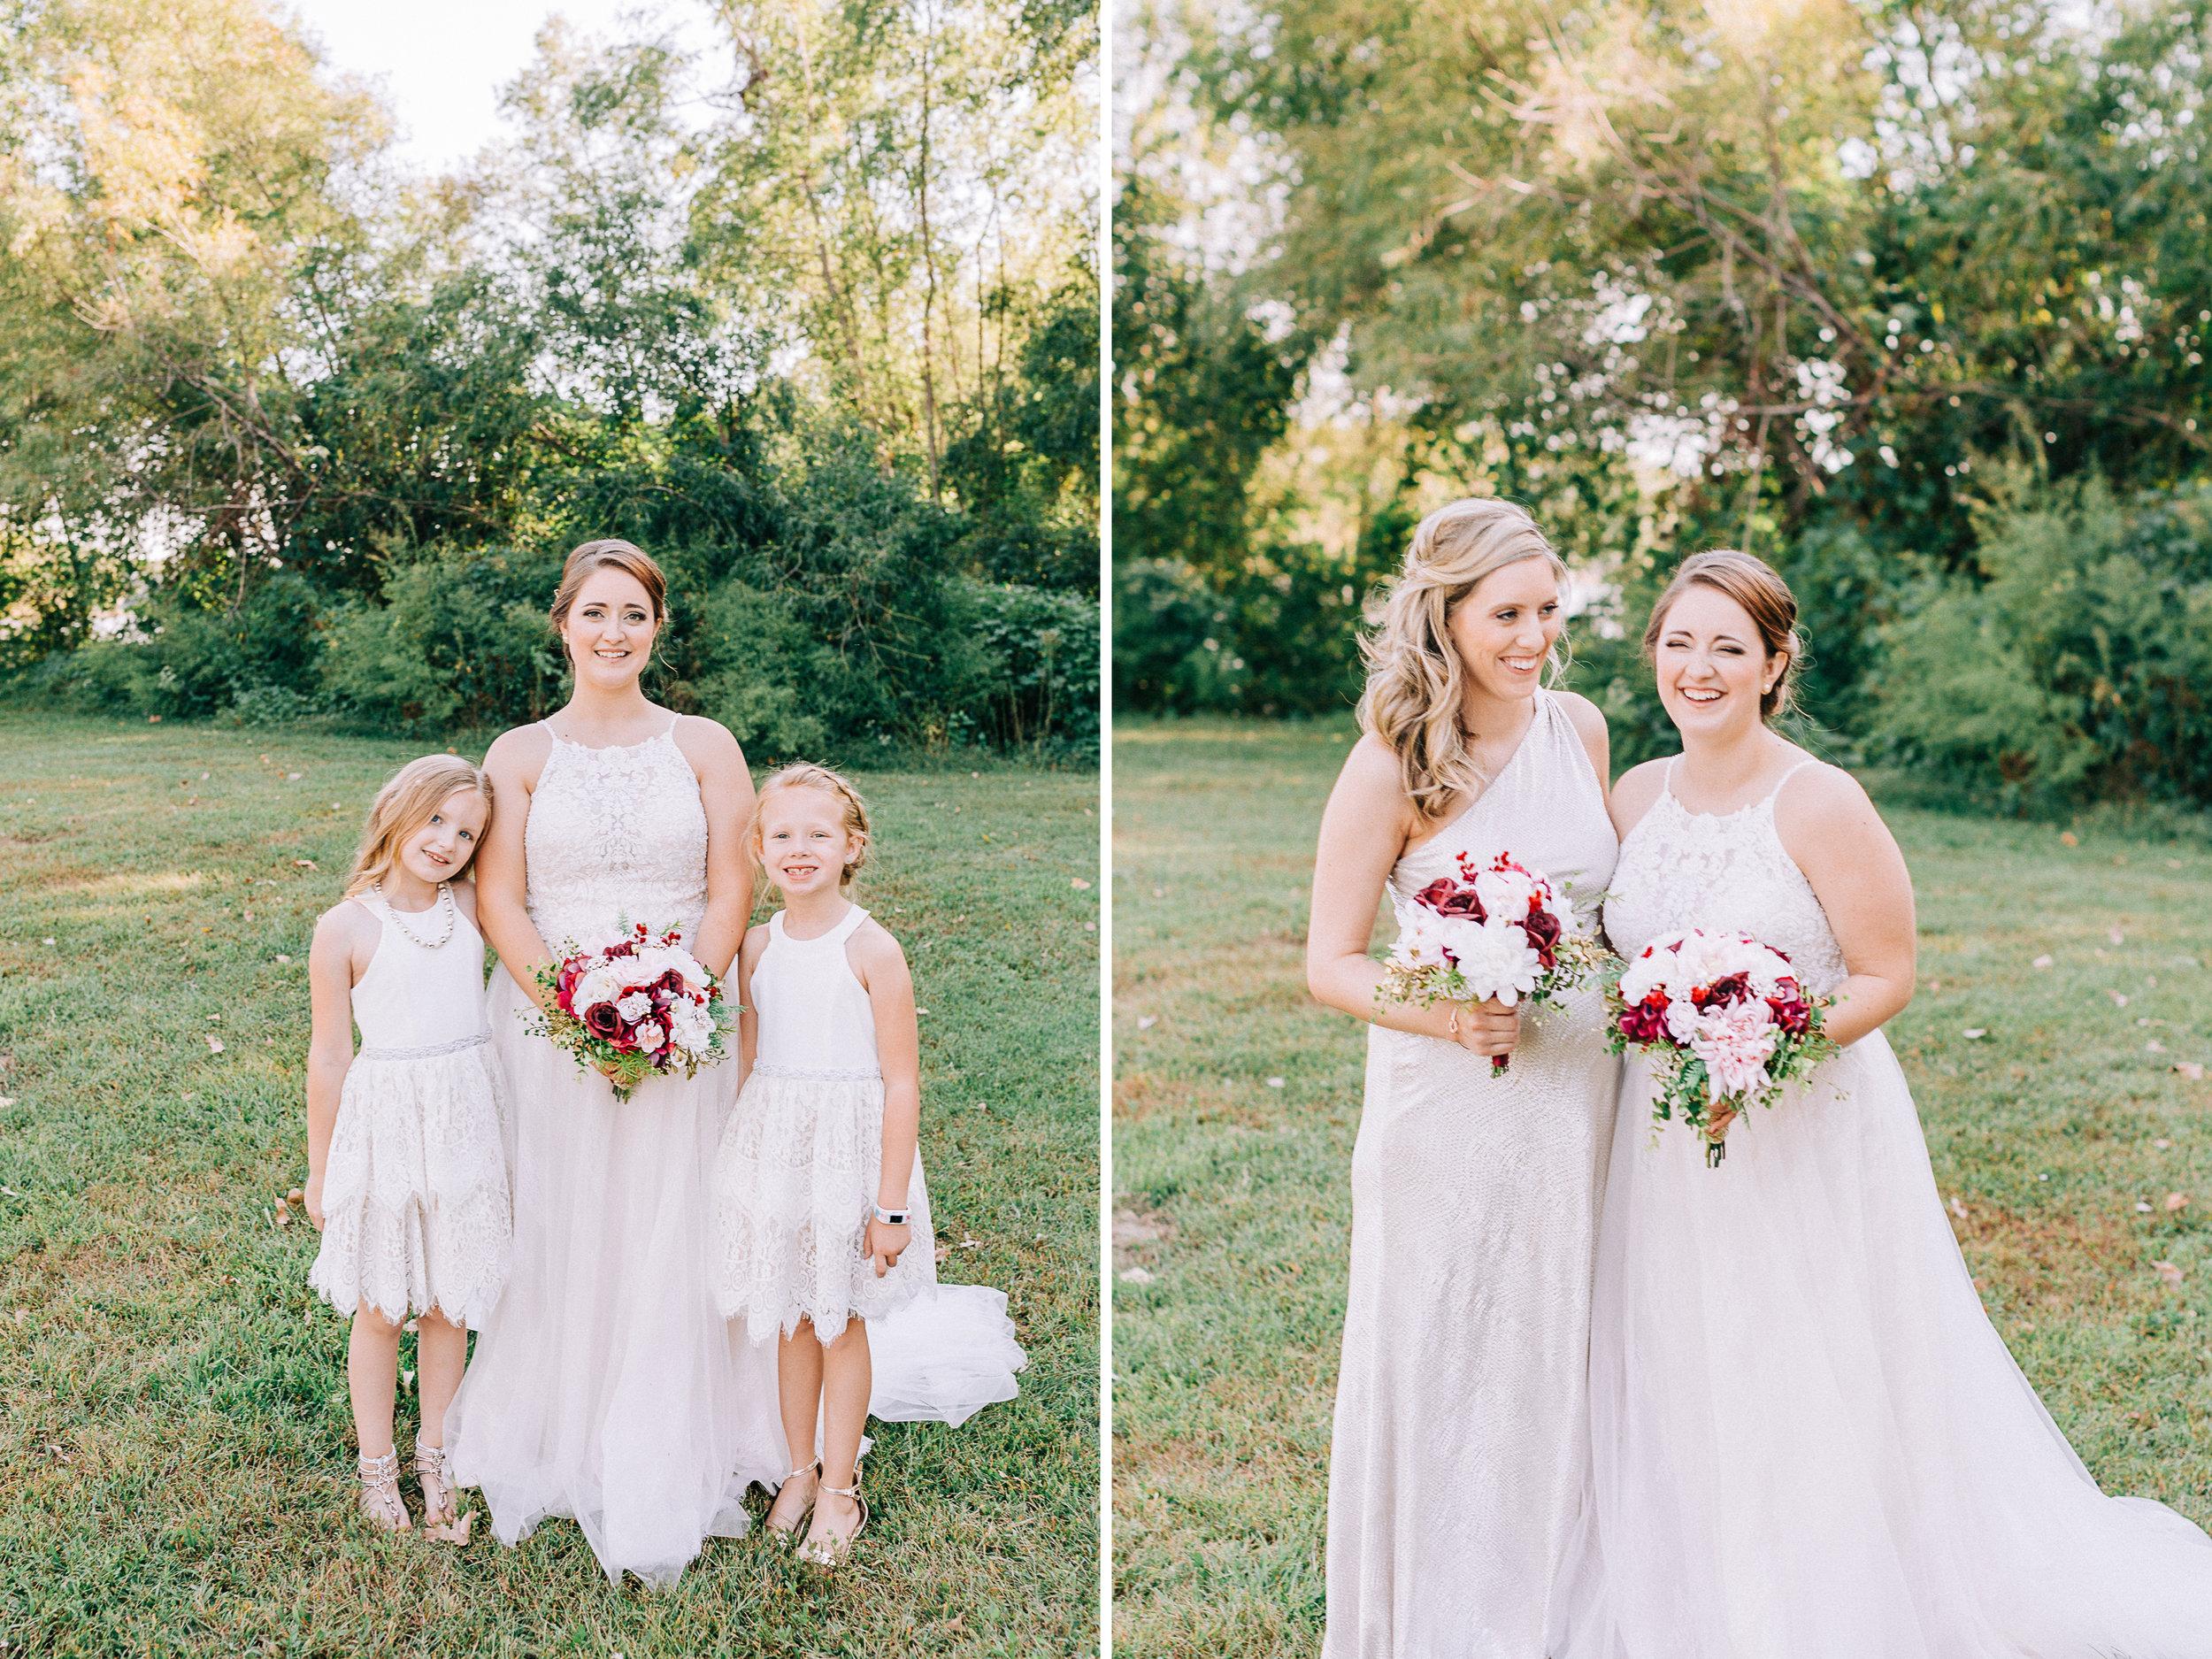 Dorothy_Louise_Photography_Eric_Fallon_La-Belle_Coeur_Main_Street_St_Charles_Wedding_Collage2.jpg